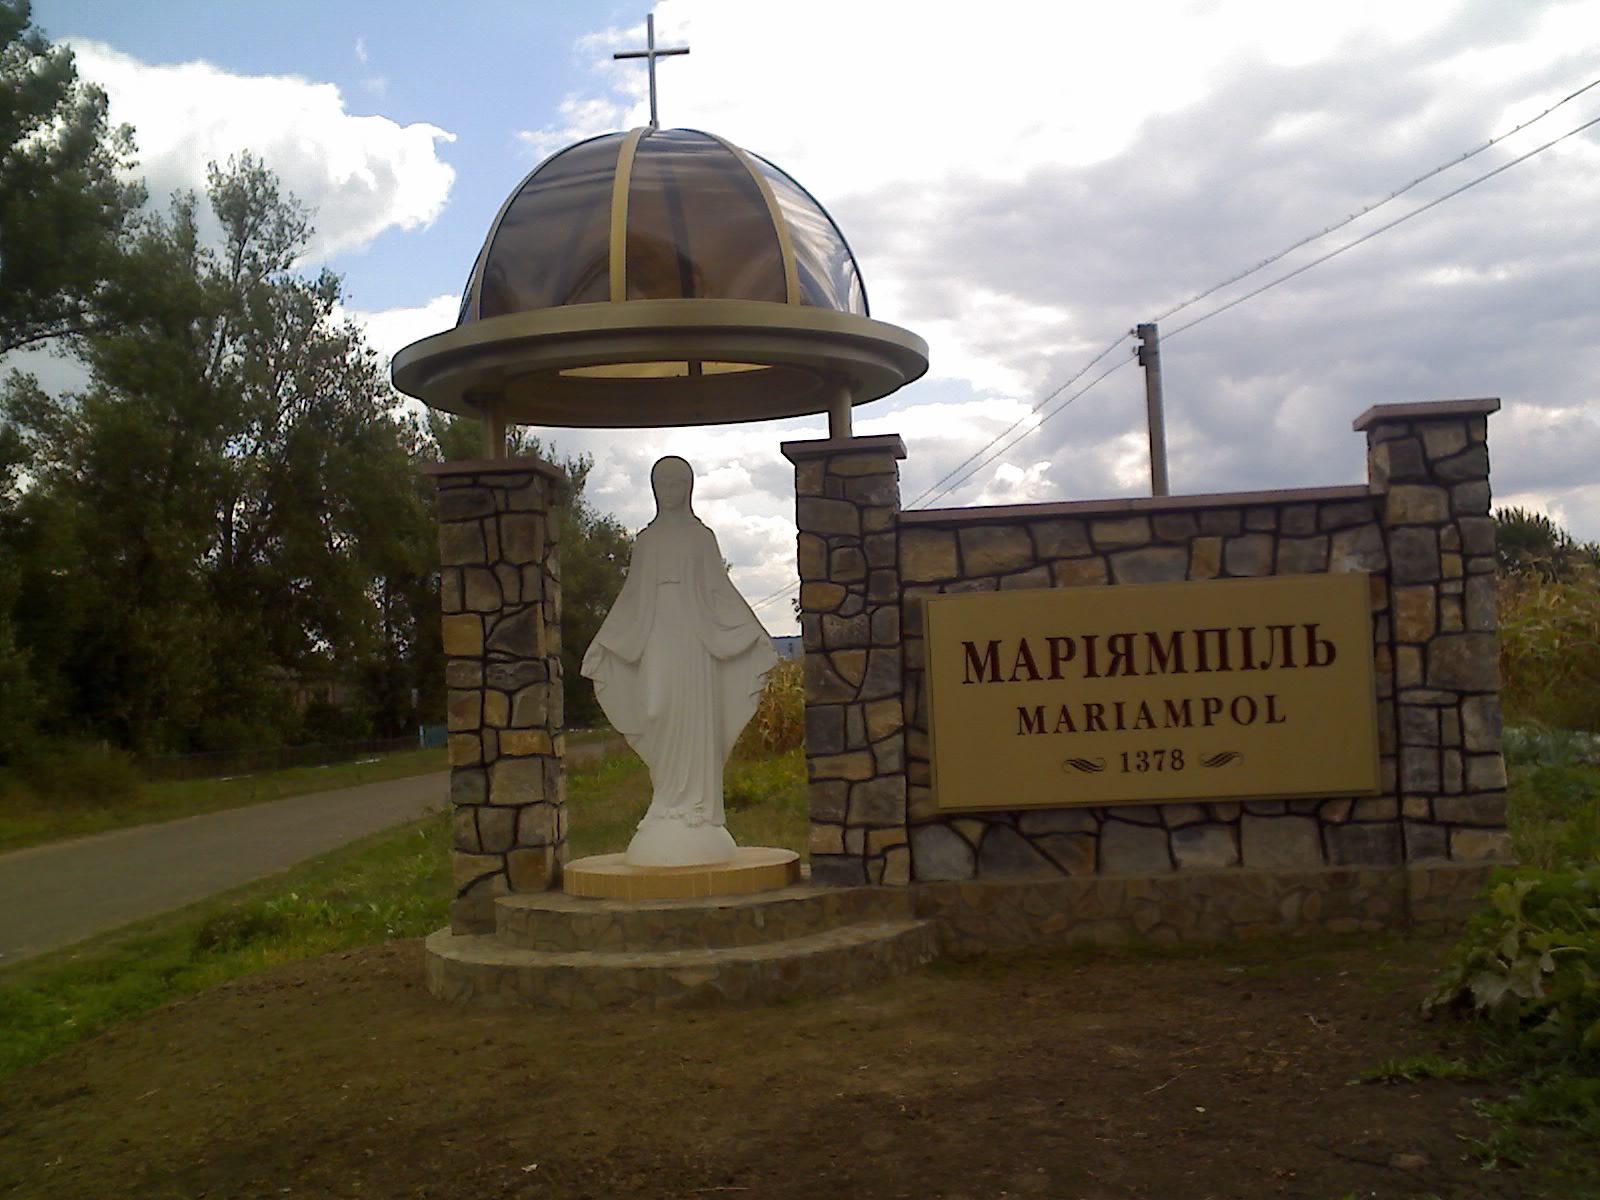 http://mariampil.ucoz.ua/_nw/0/06165671.jpg